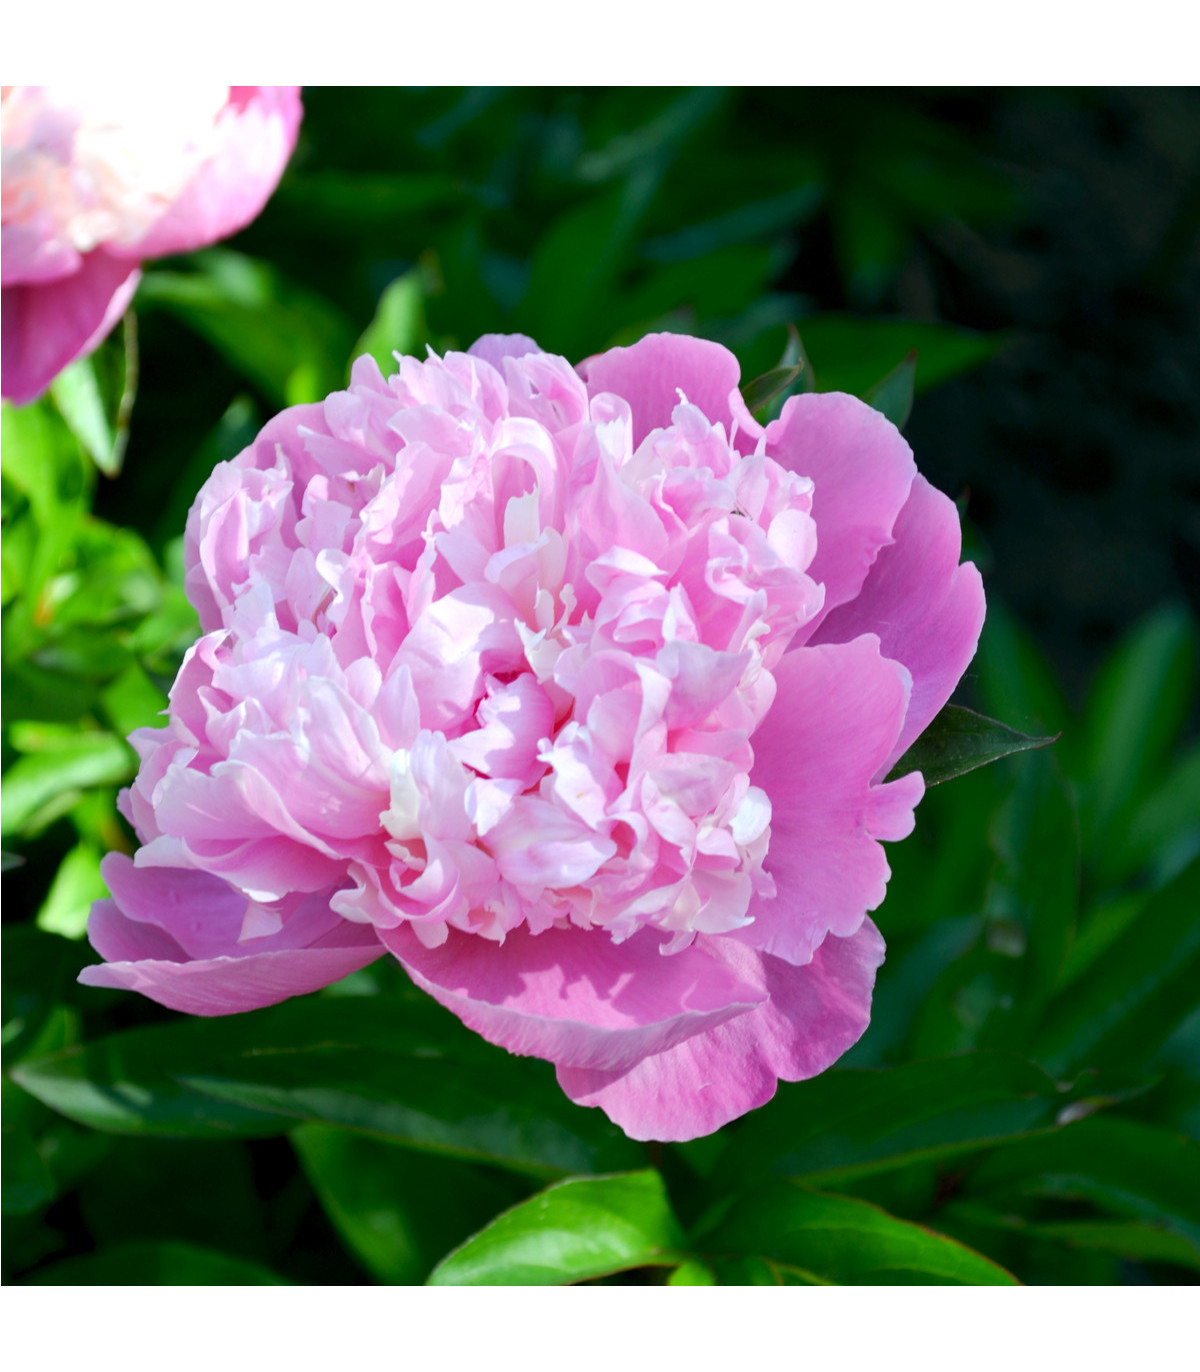 Pivoňka růžová Dr. Alex Flamming - Paeonia lactiflora - hlízy pivoněk - 1 ks